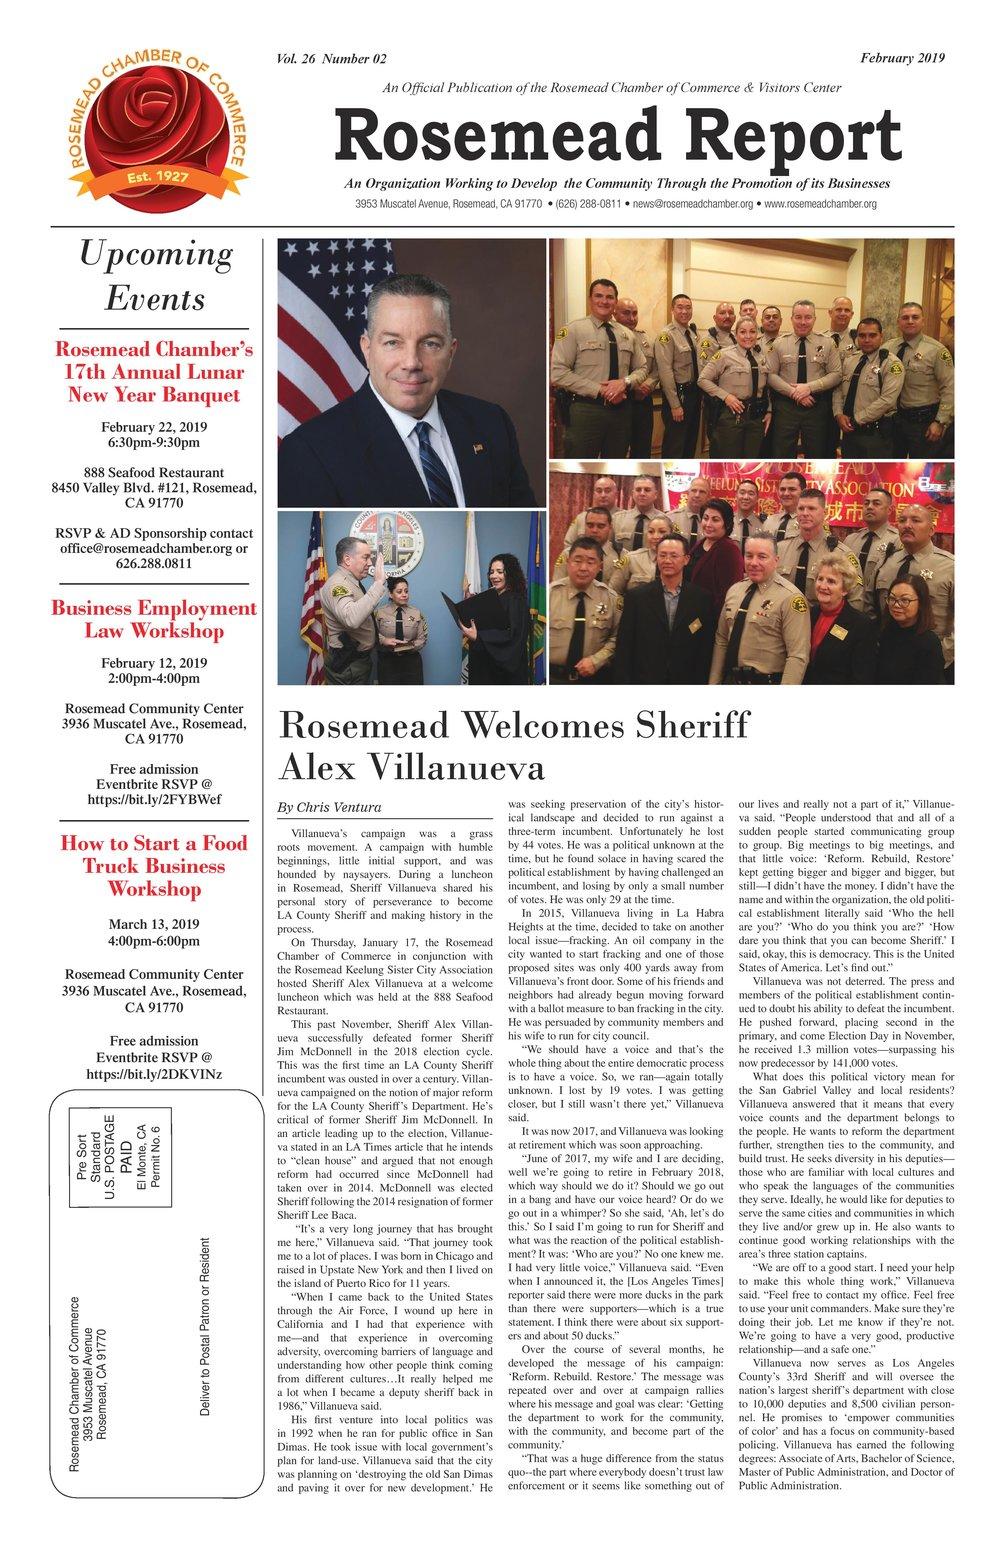 FEBRUARY 2019 - Rosemead Report